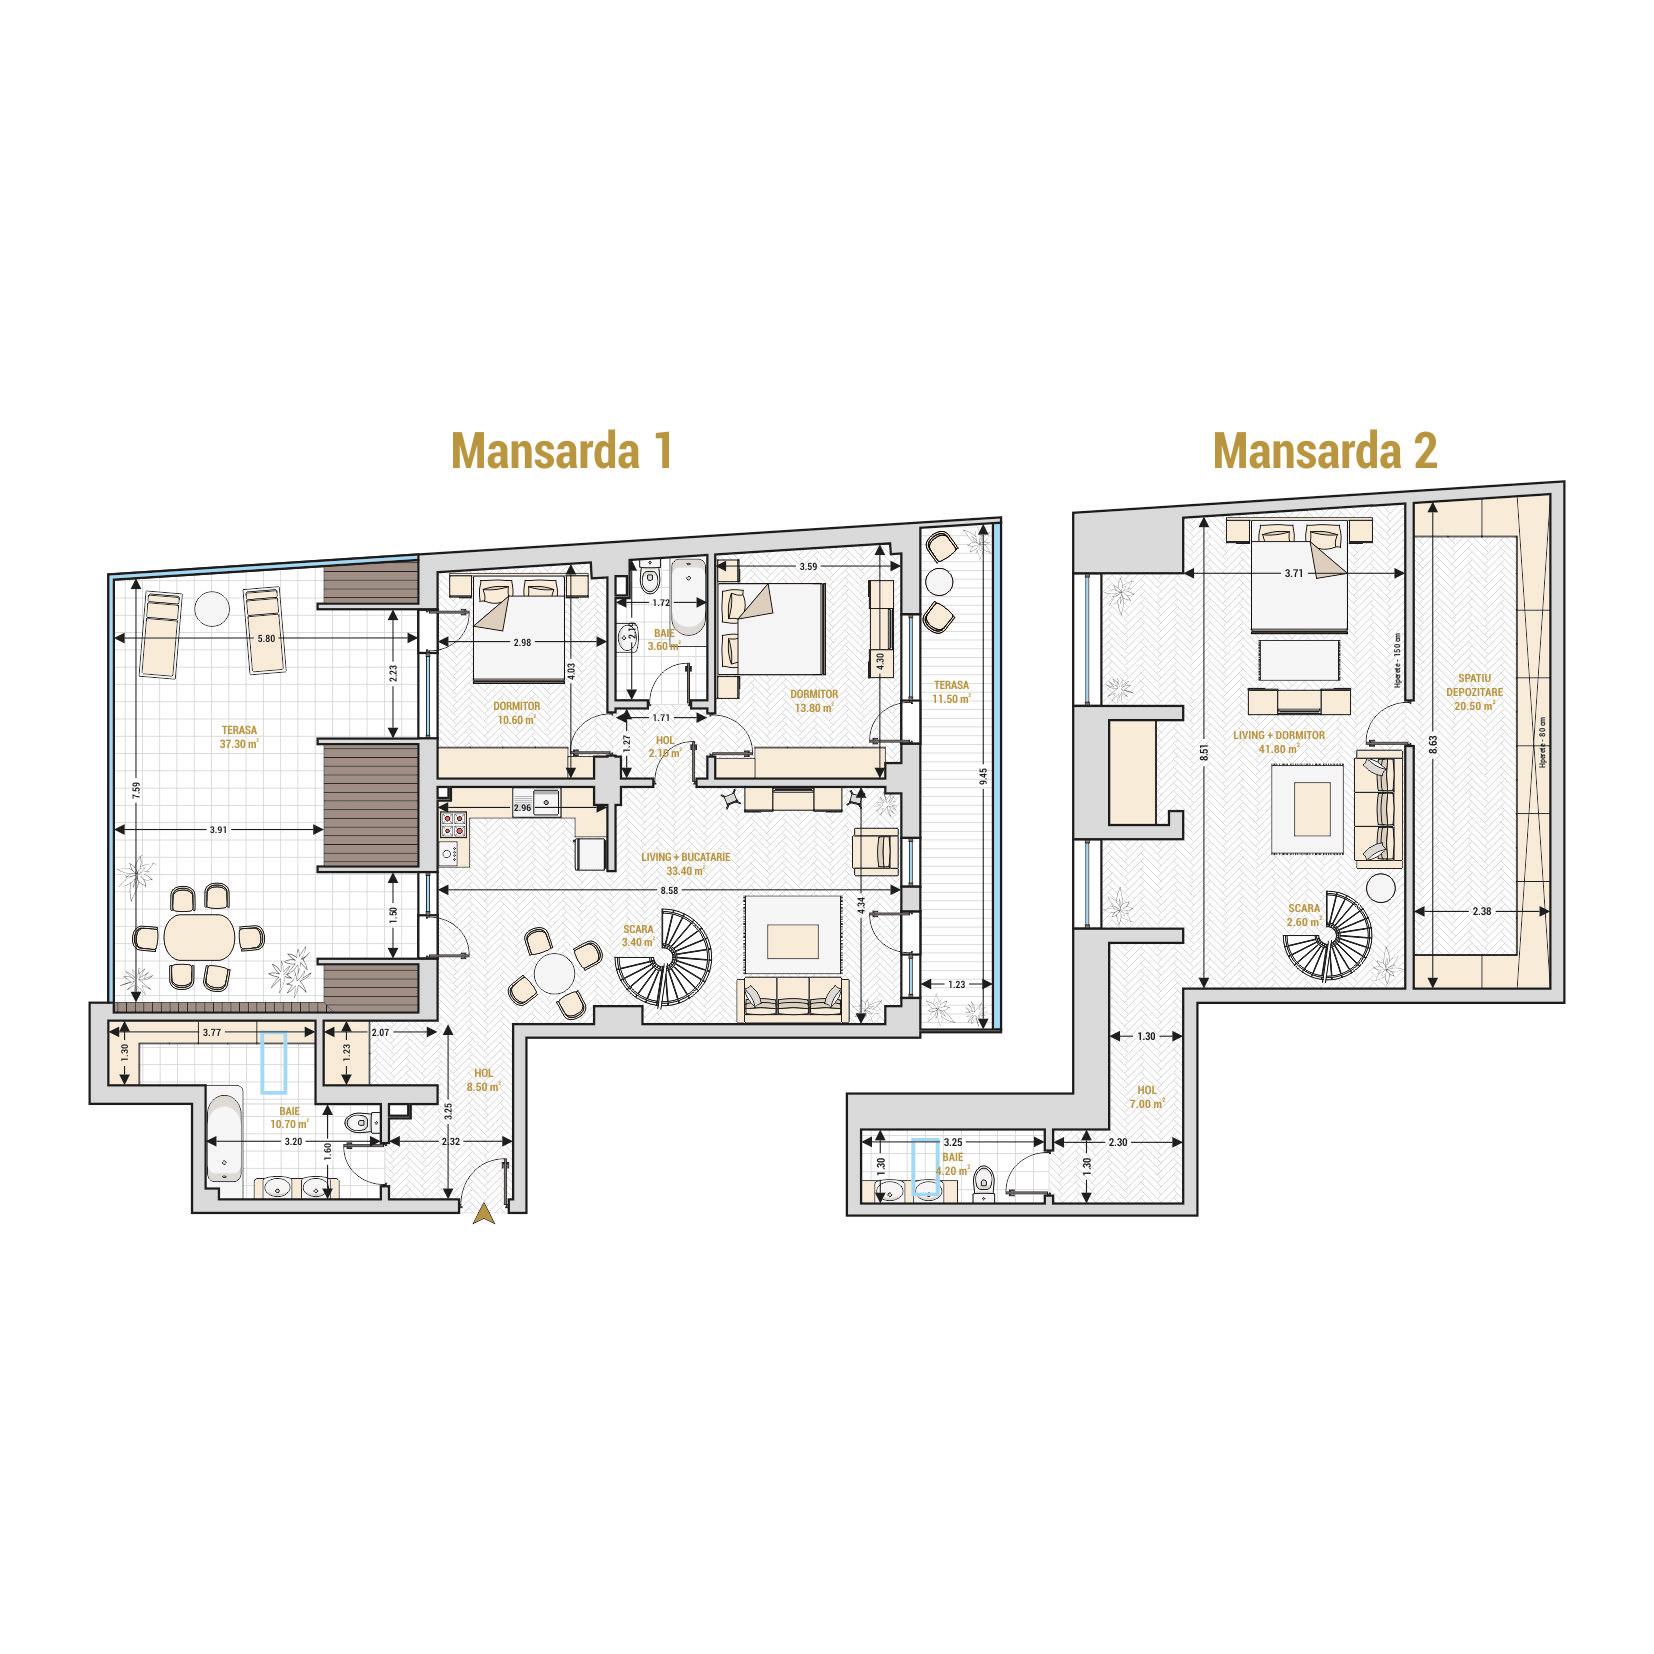 Duplex cu 4 camere Bucuresti - Catedral Residence - Marriott, Piata Unirii, 13 Septembrie, Izvor - Suprafata utila totala - 211.00 mp